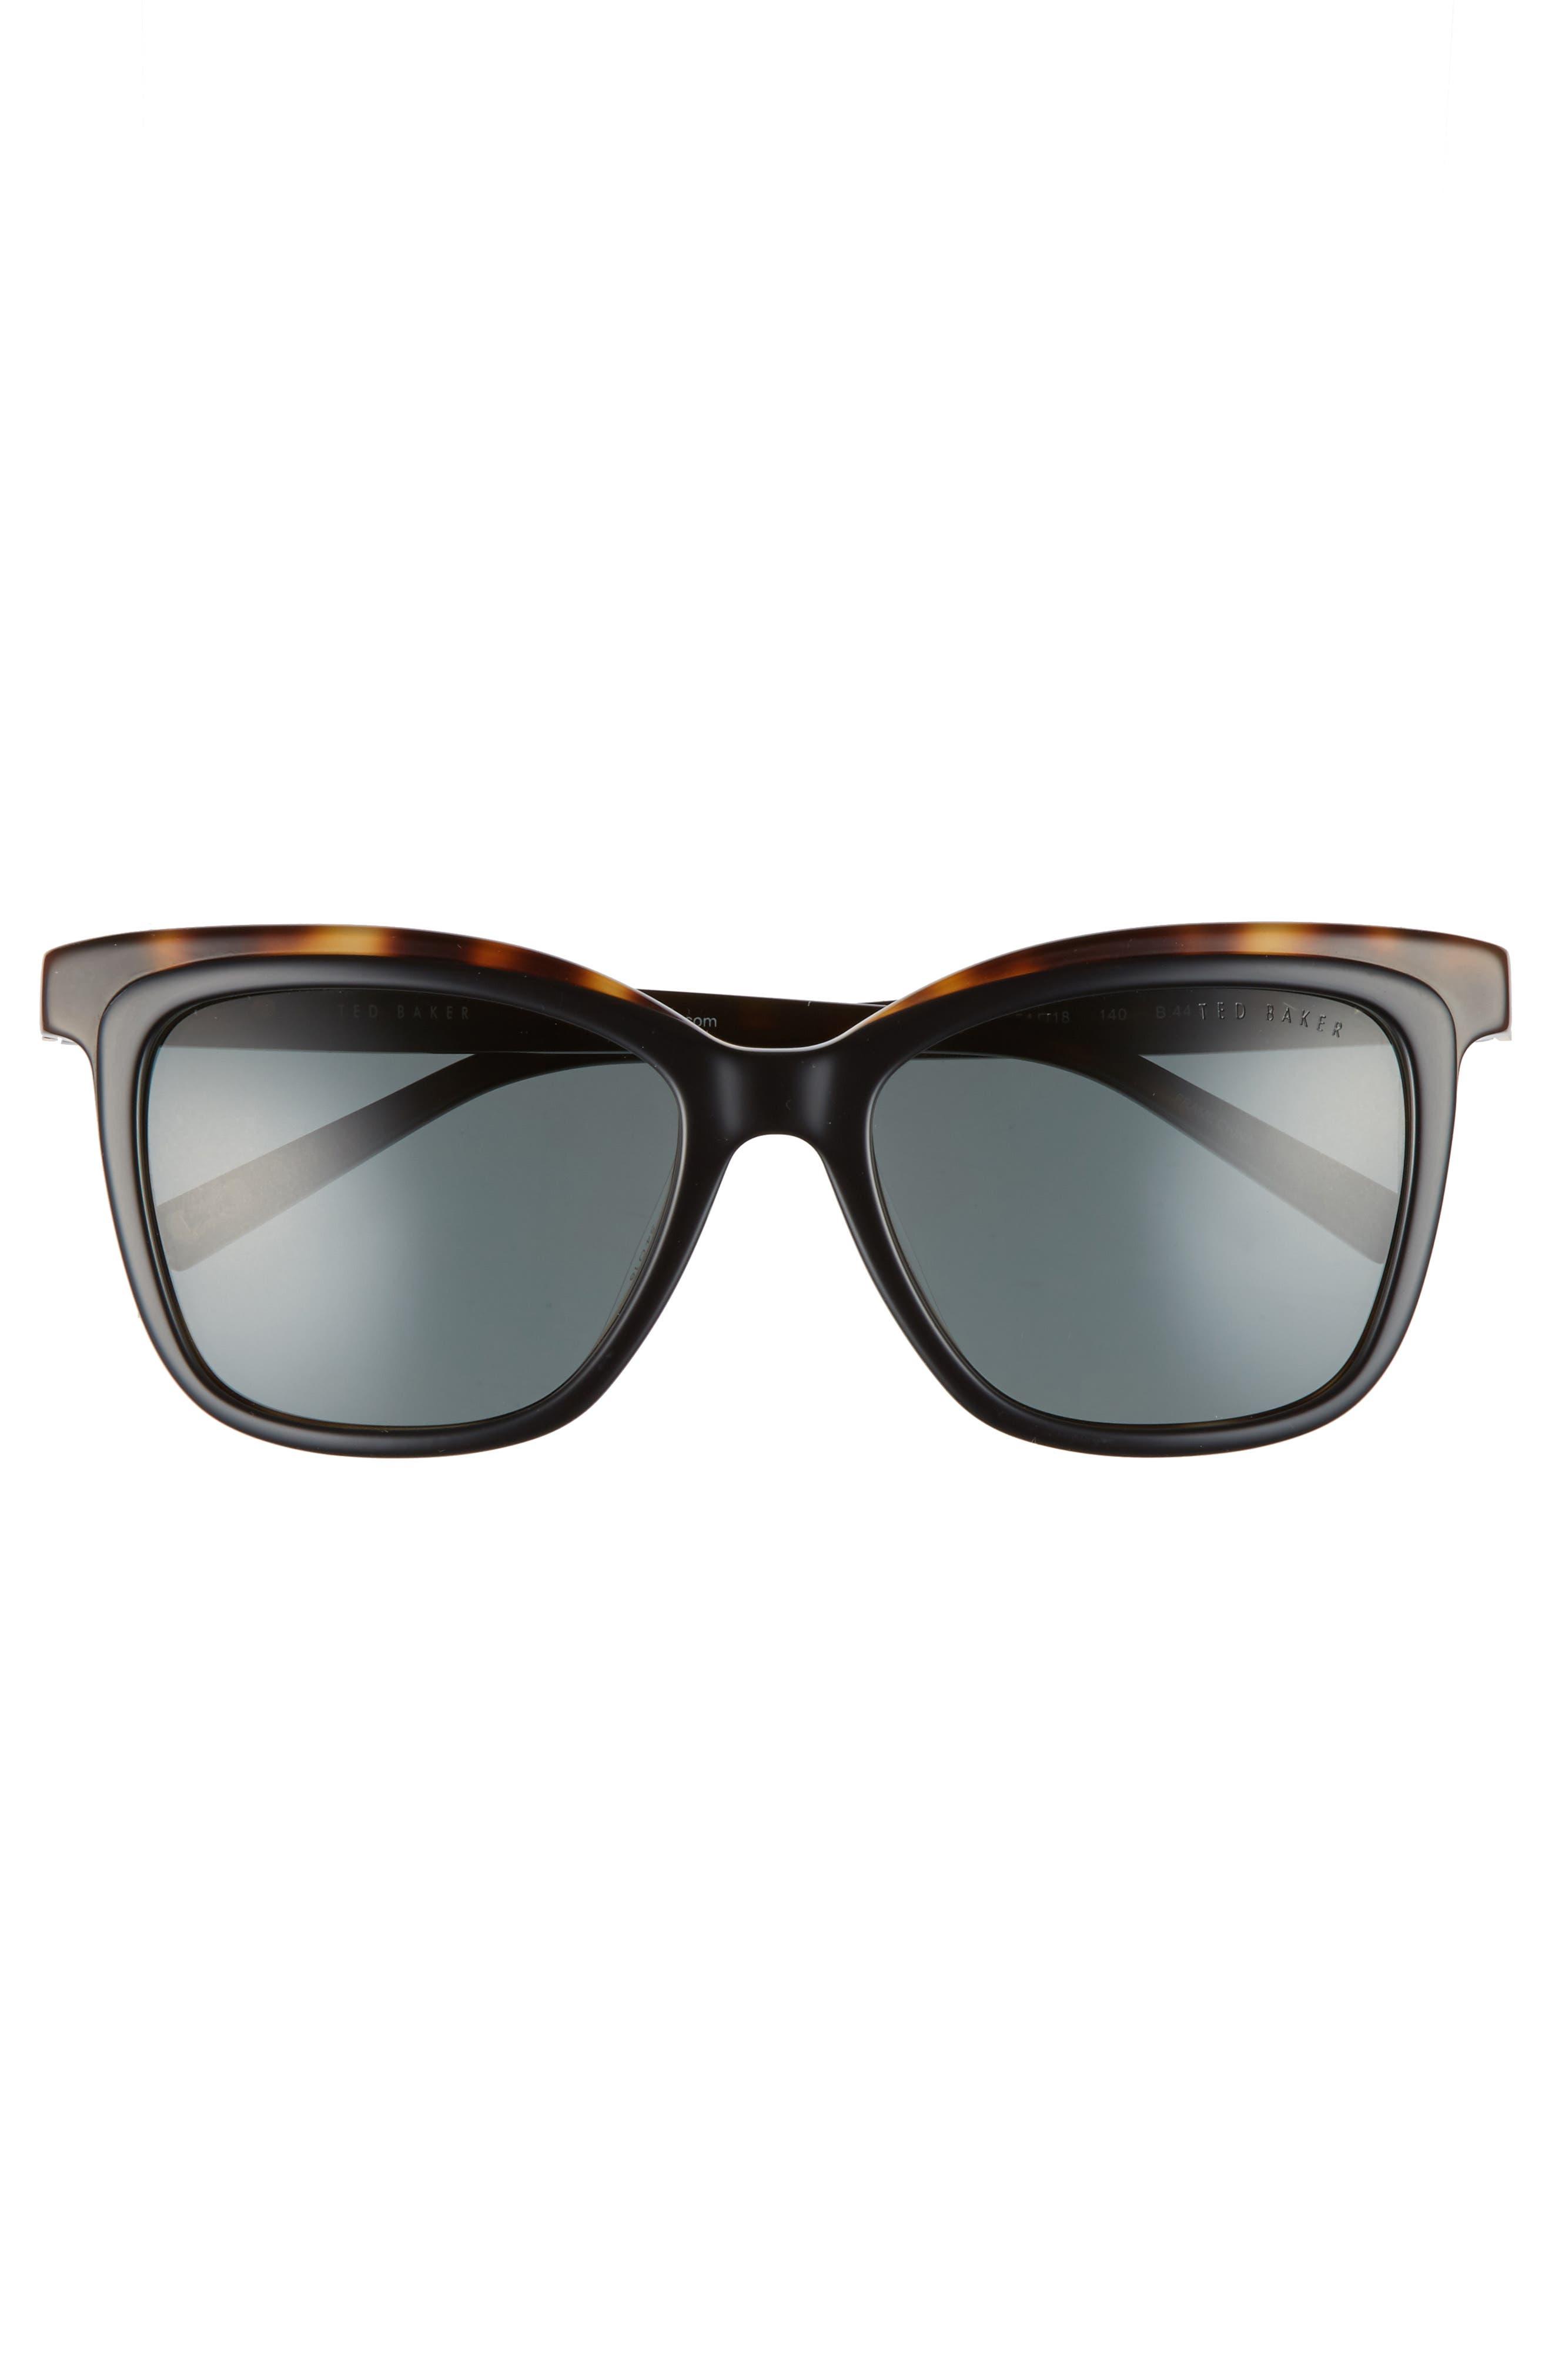 54mm Polarized Cat Eye Sunglasses,                             Alternate thumbnail 3, color,                             002